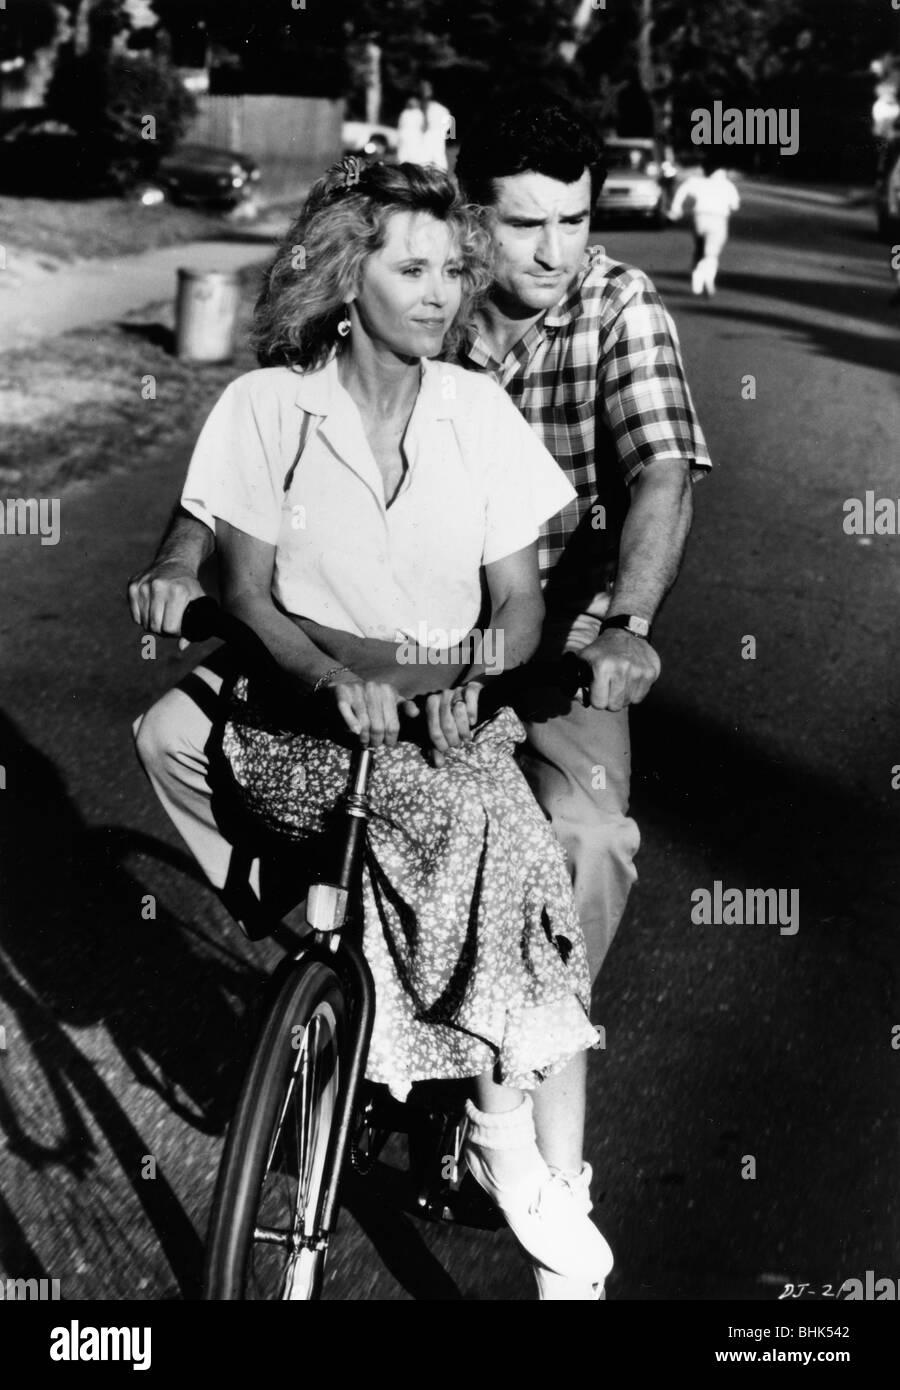 Jane Fonda (1937- ) and Robert De Niro (1943- ), 1990. - Stock Image